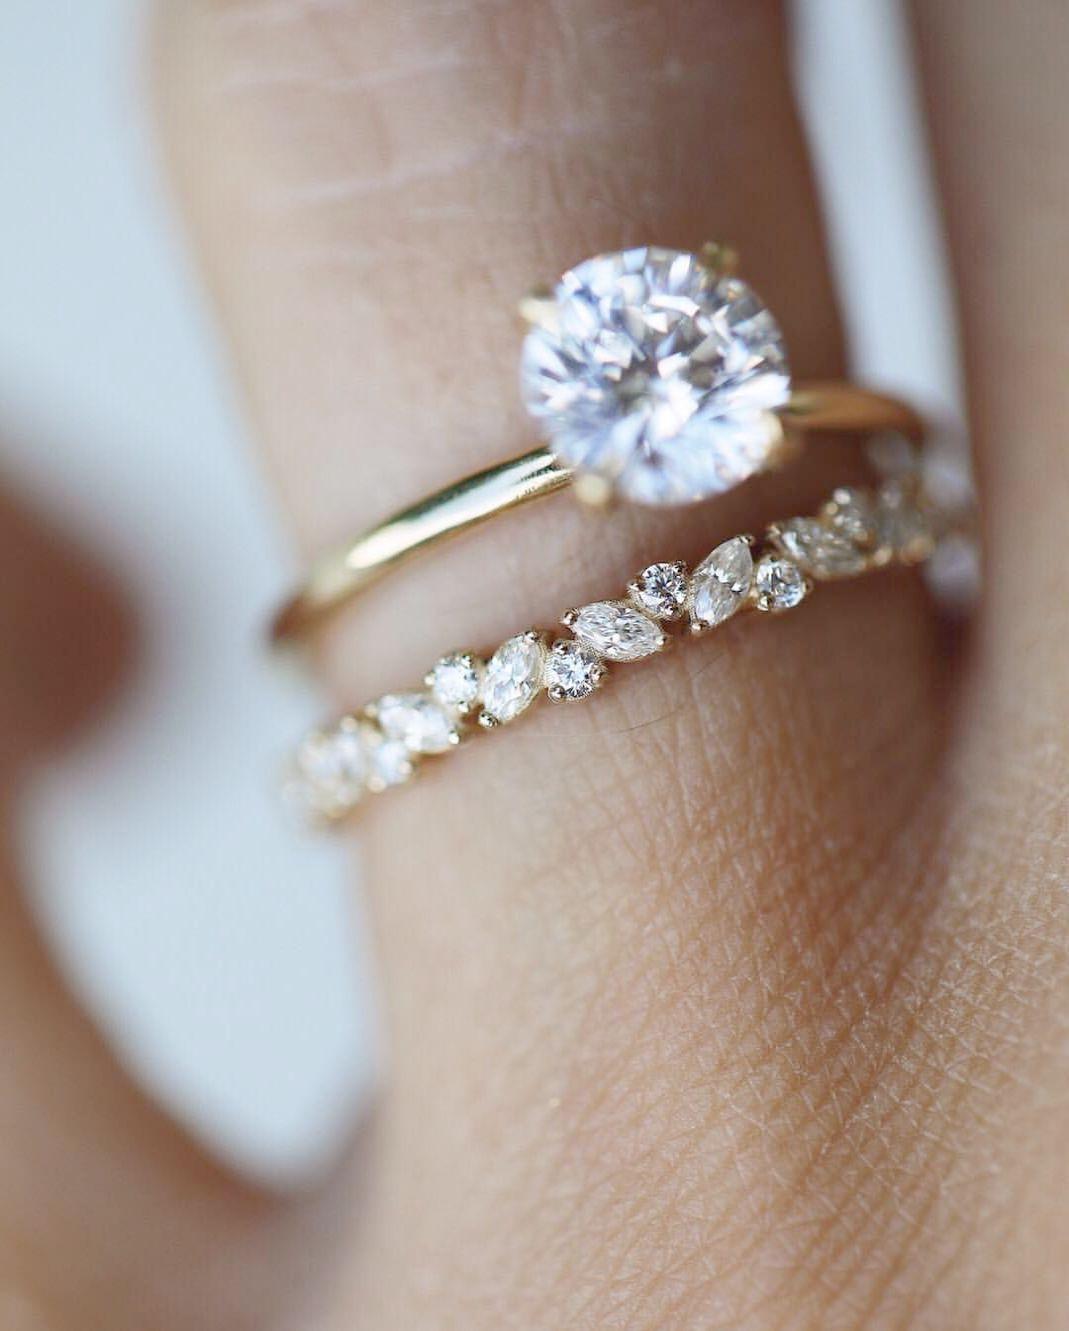 2 Carat Diamond Engagement Rings Costco Opposite Engagement Ring Champag Vintage Engagement Rings Unique Moonstone Engagement Ring Set Vintage Engagement Rings